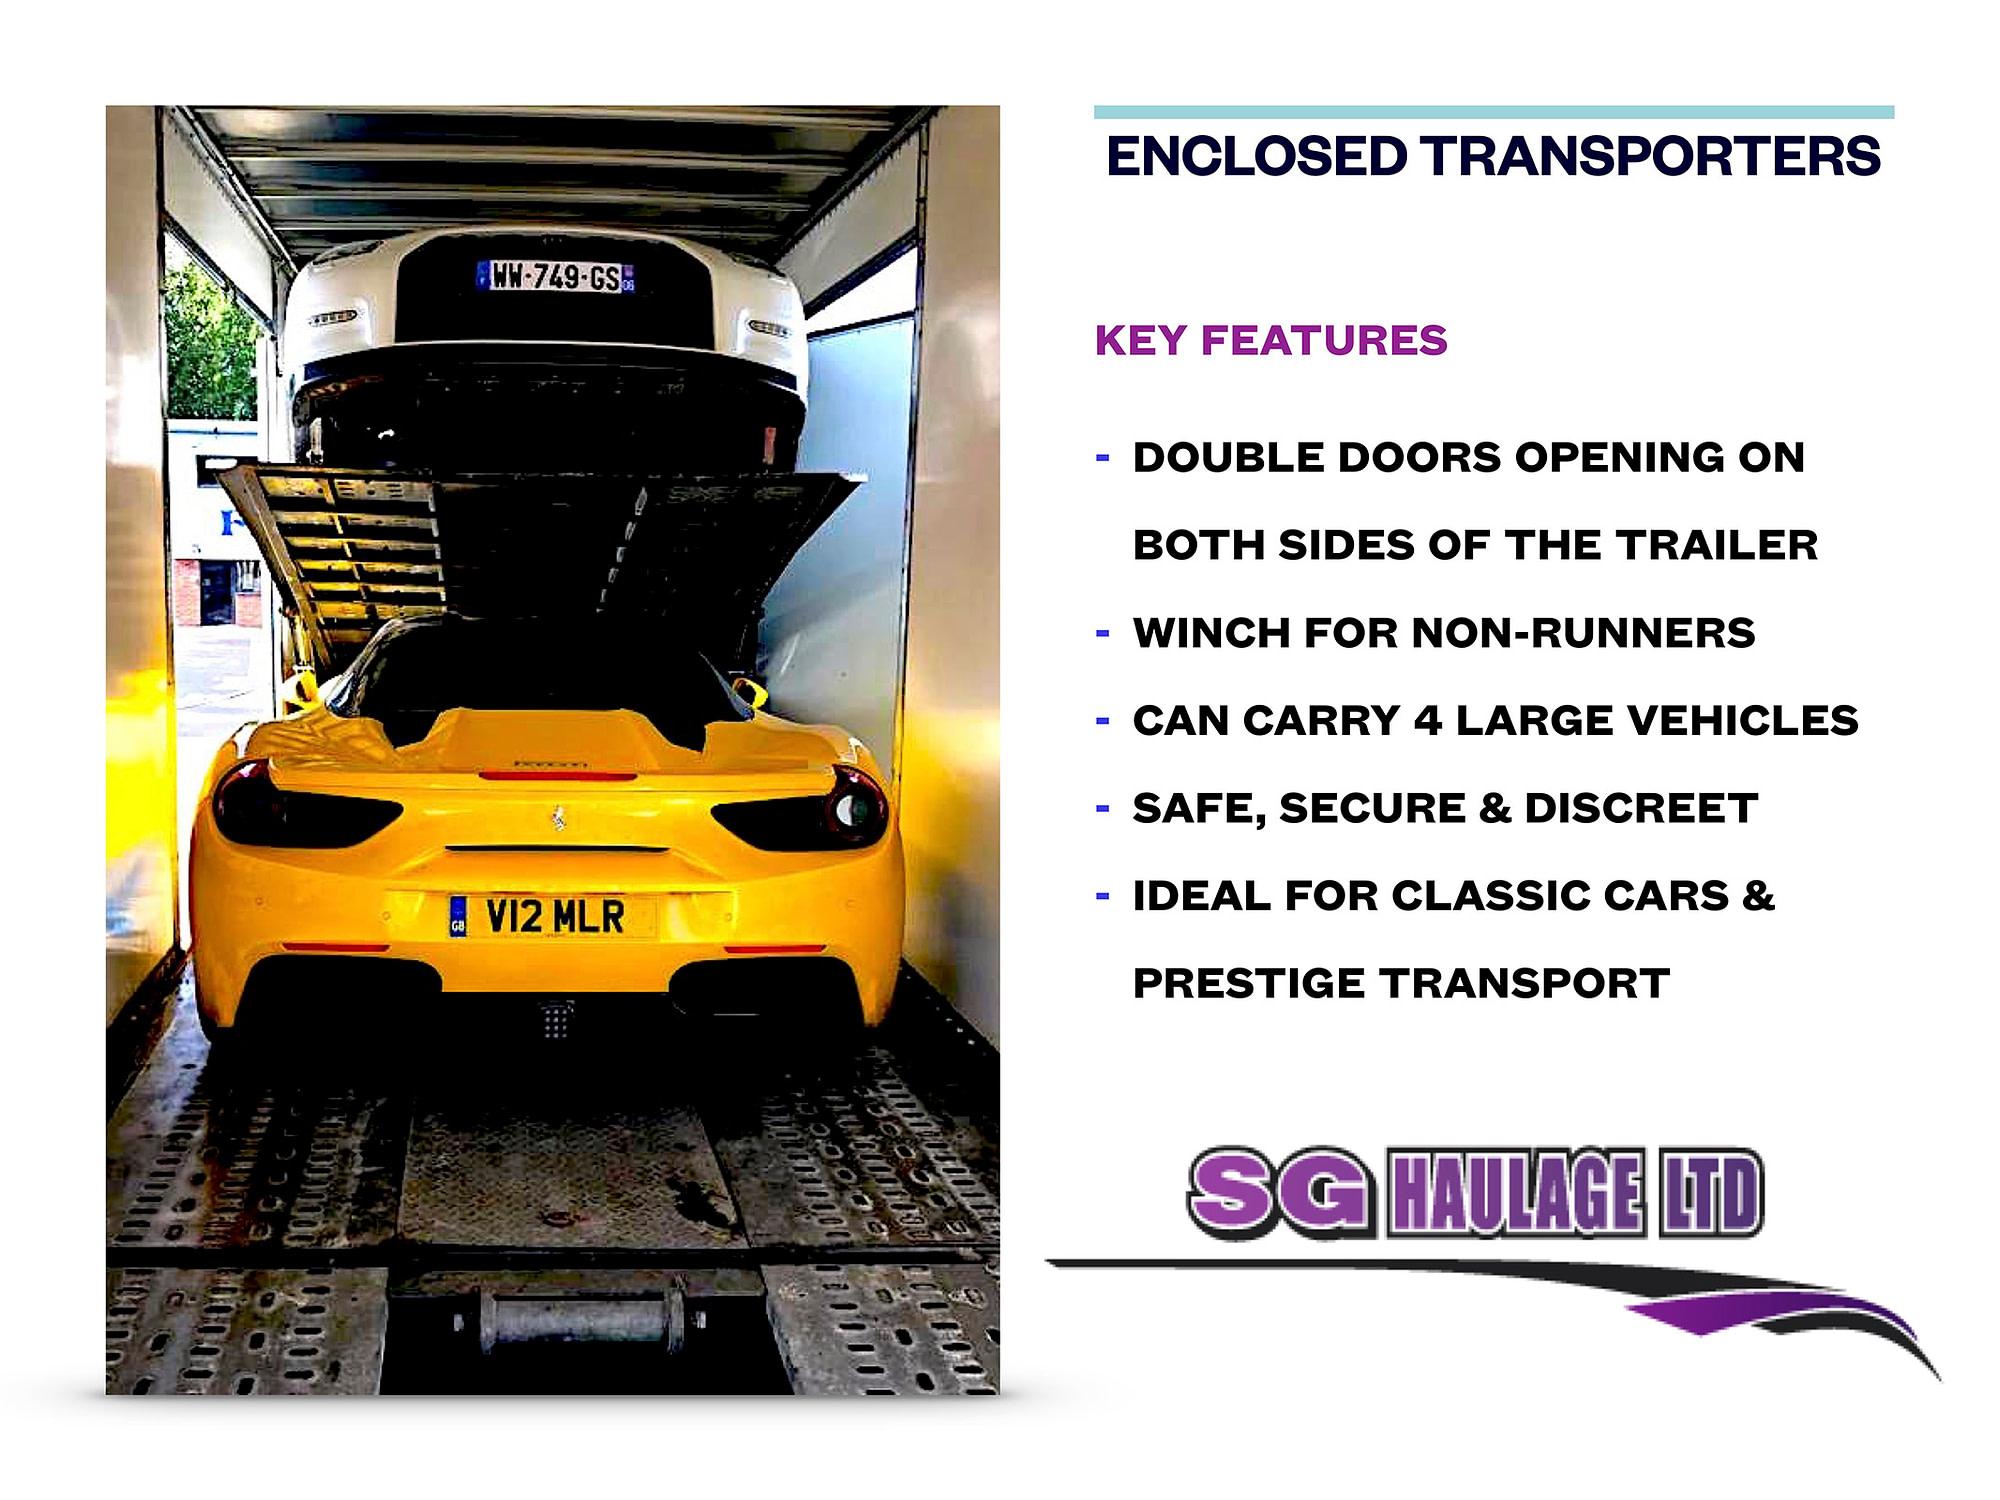 Enclosed Transporters